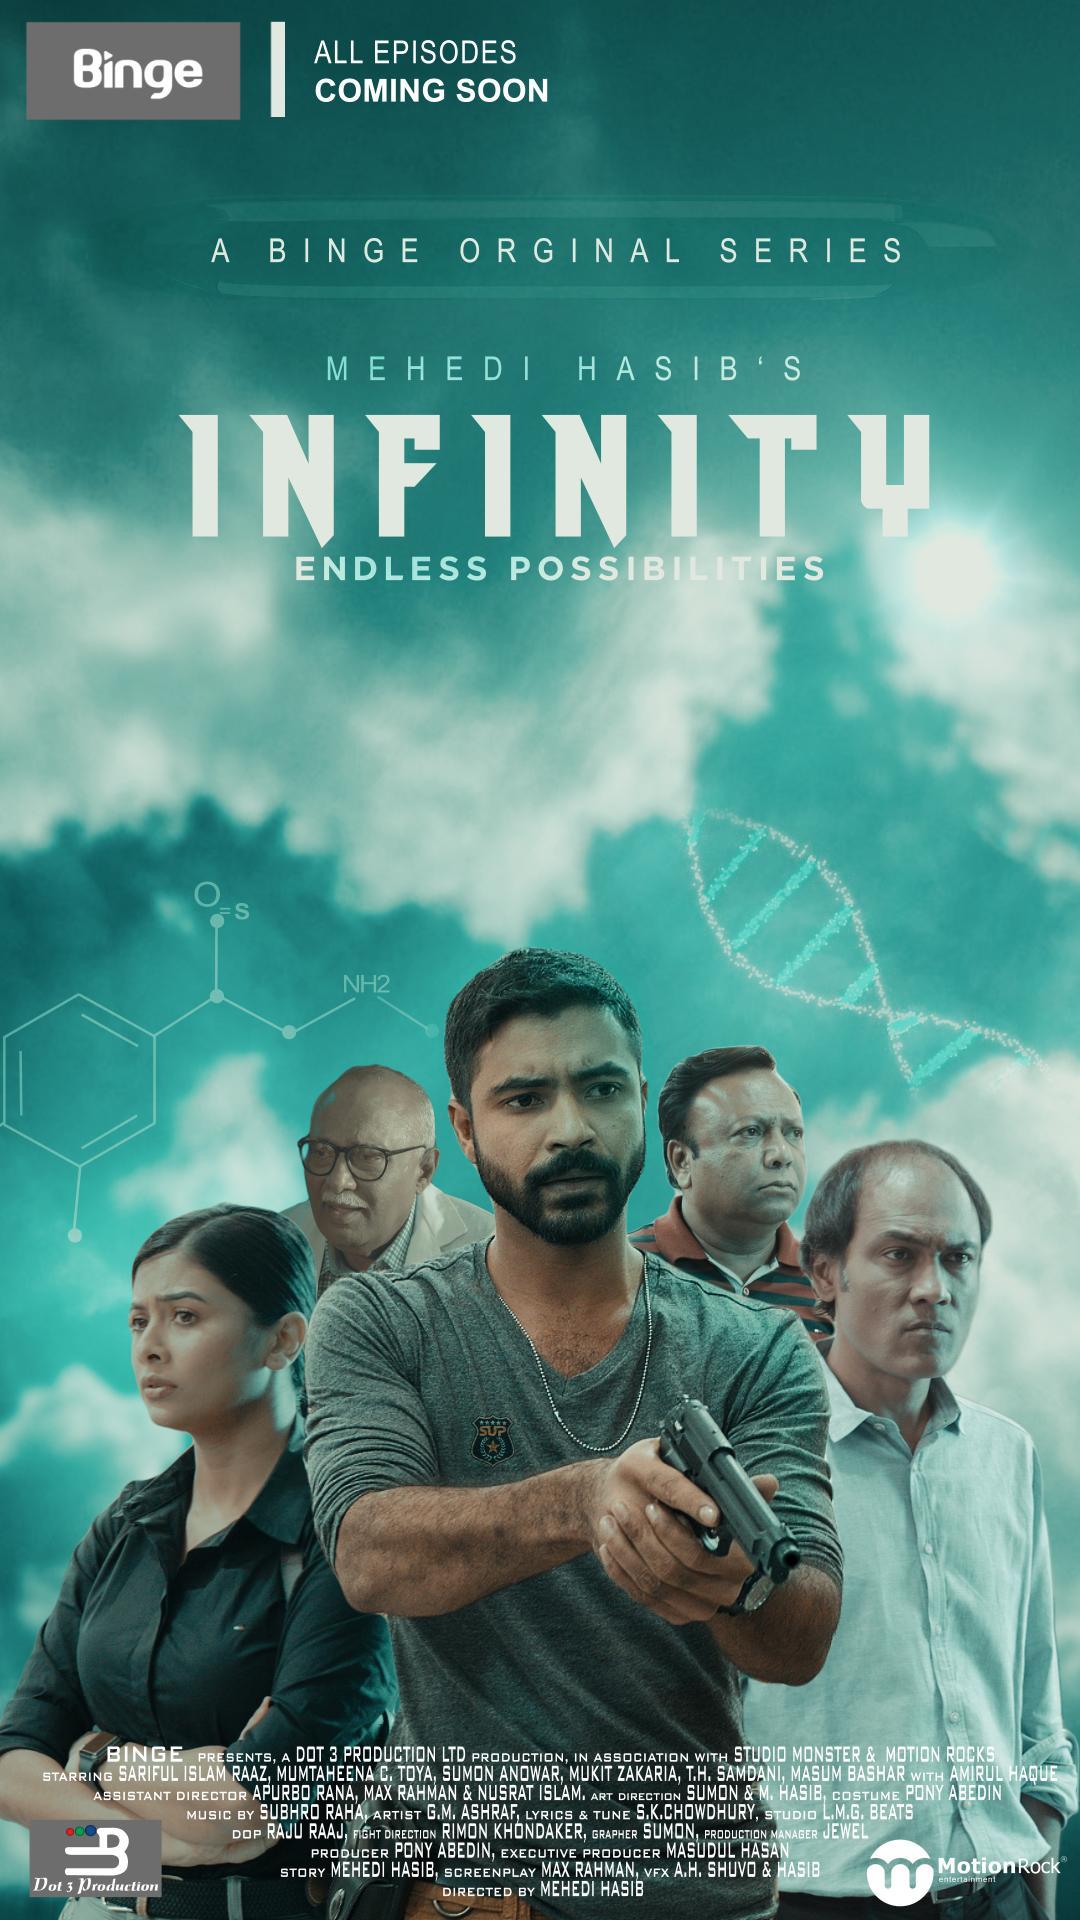 Infinity season 1